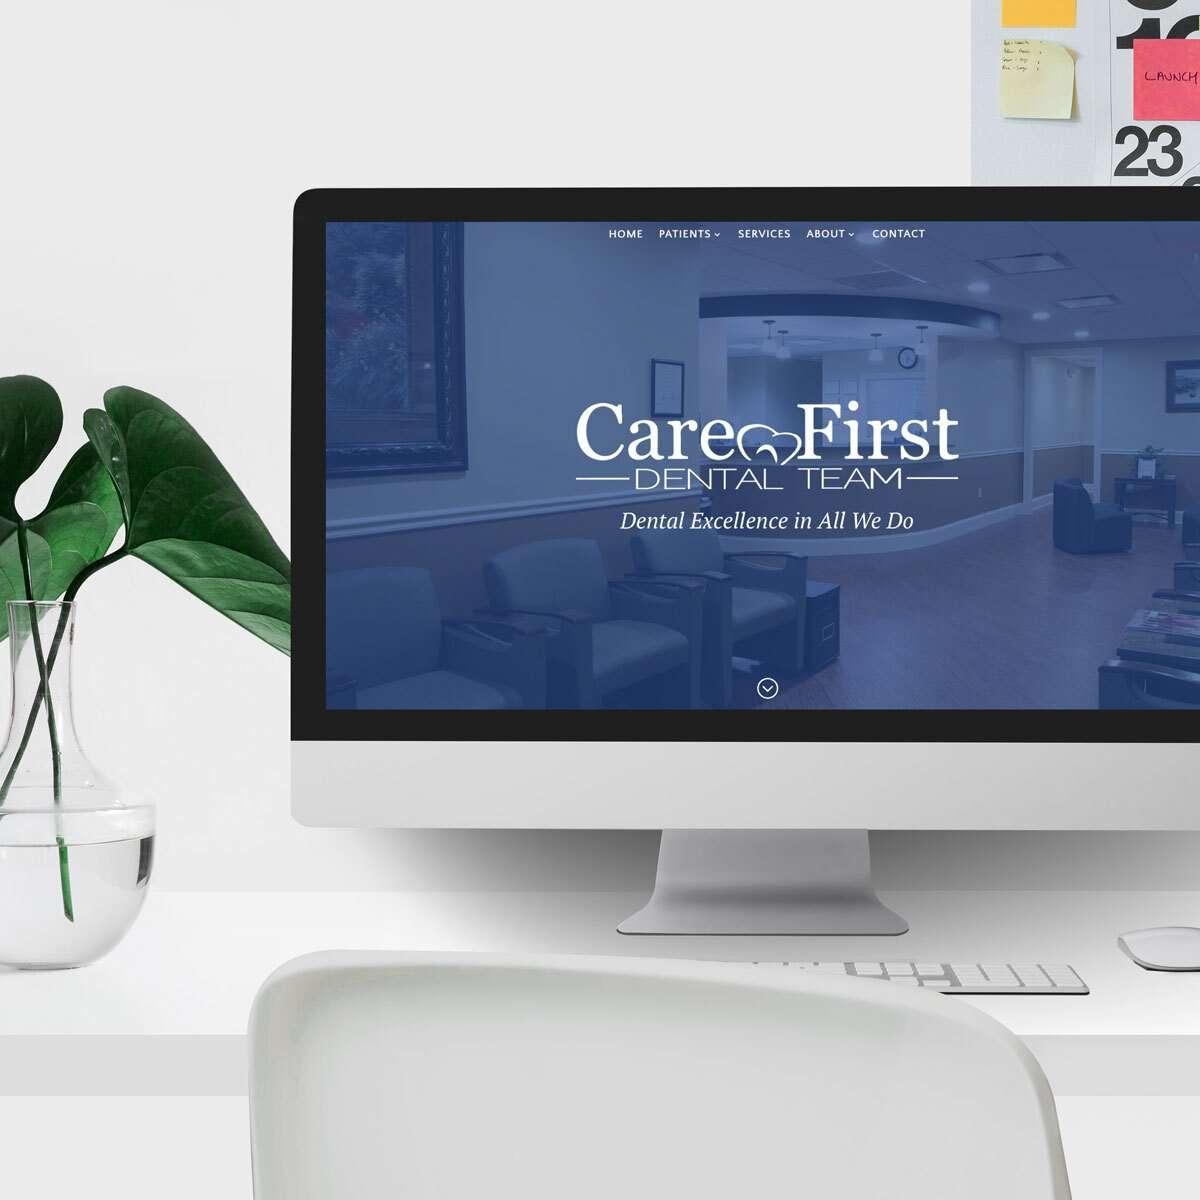 Care First Dental Team Web Design by BrandSwan, a web design company